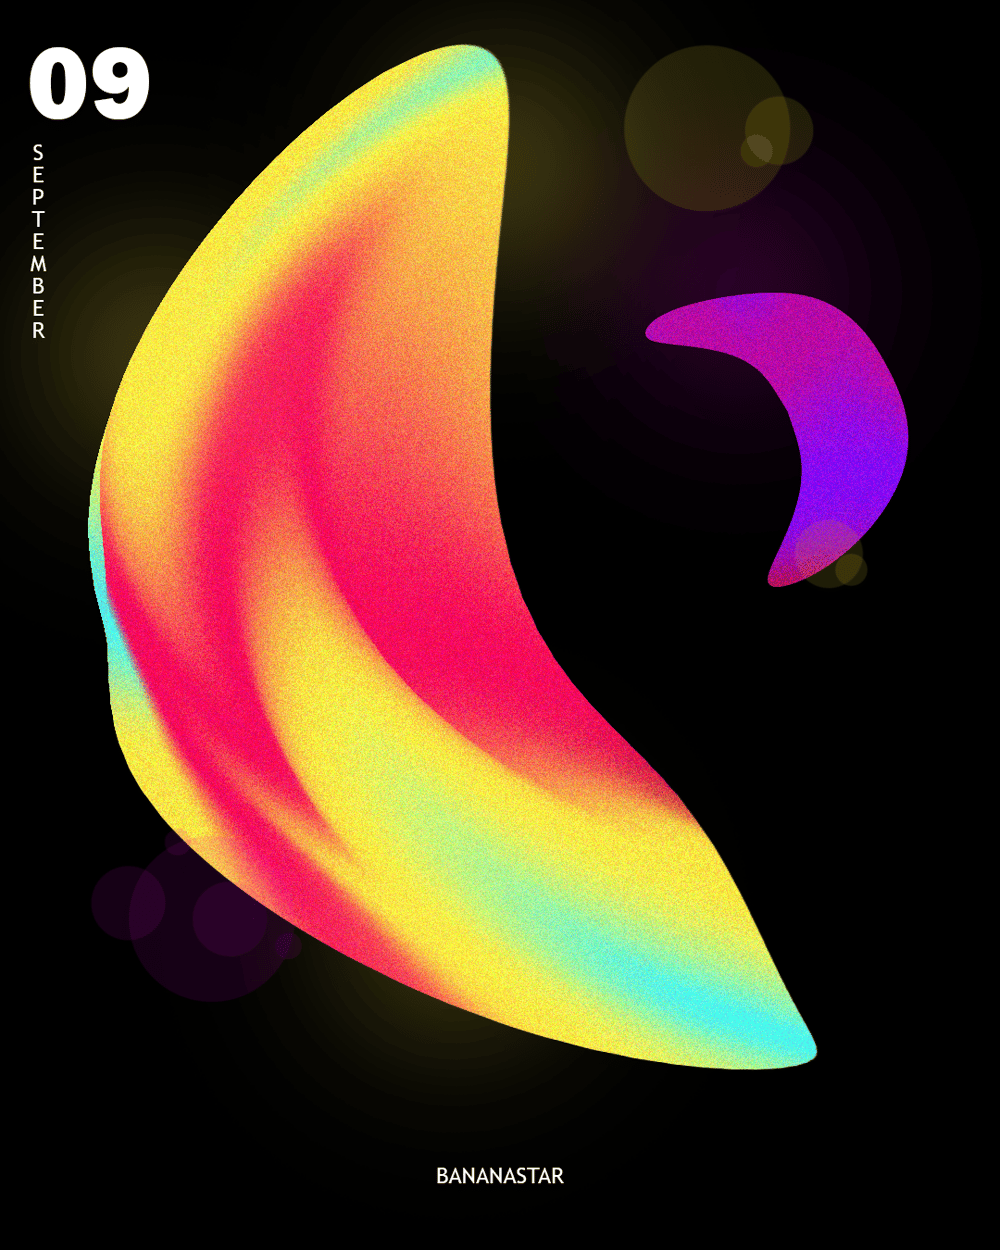 BananaStar - image 1 - student project